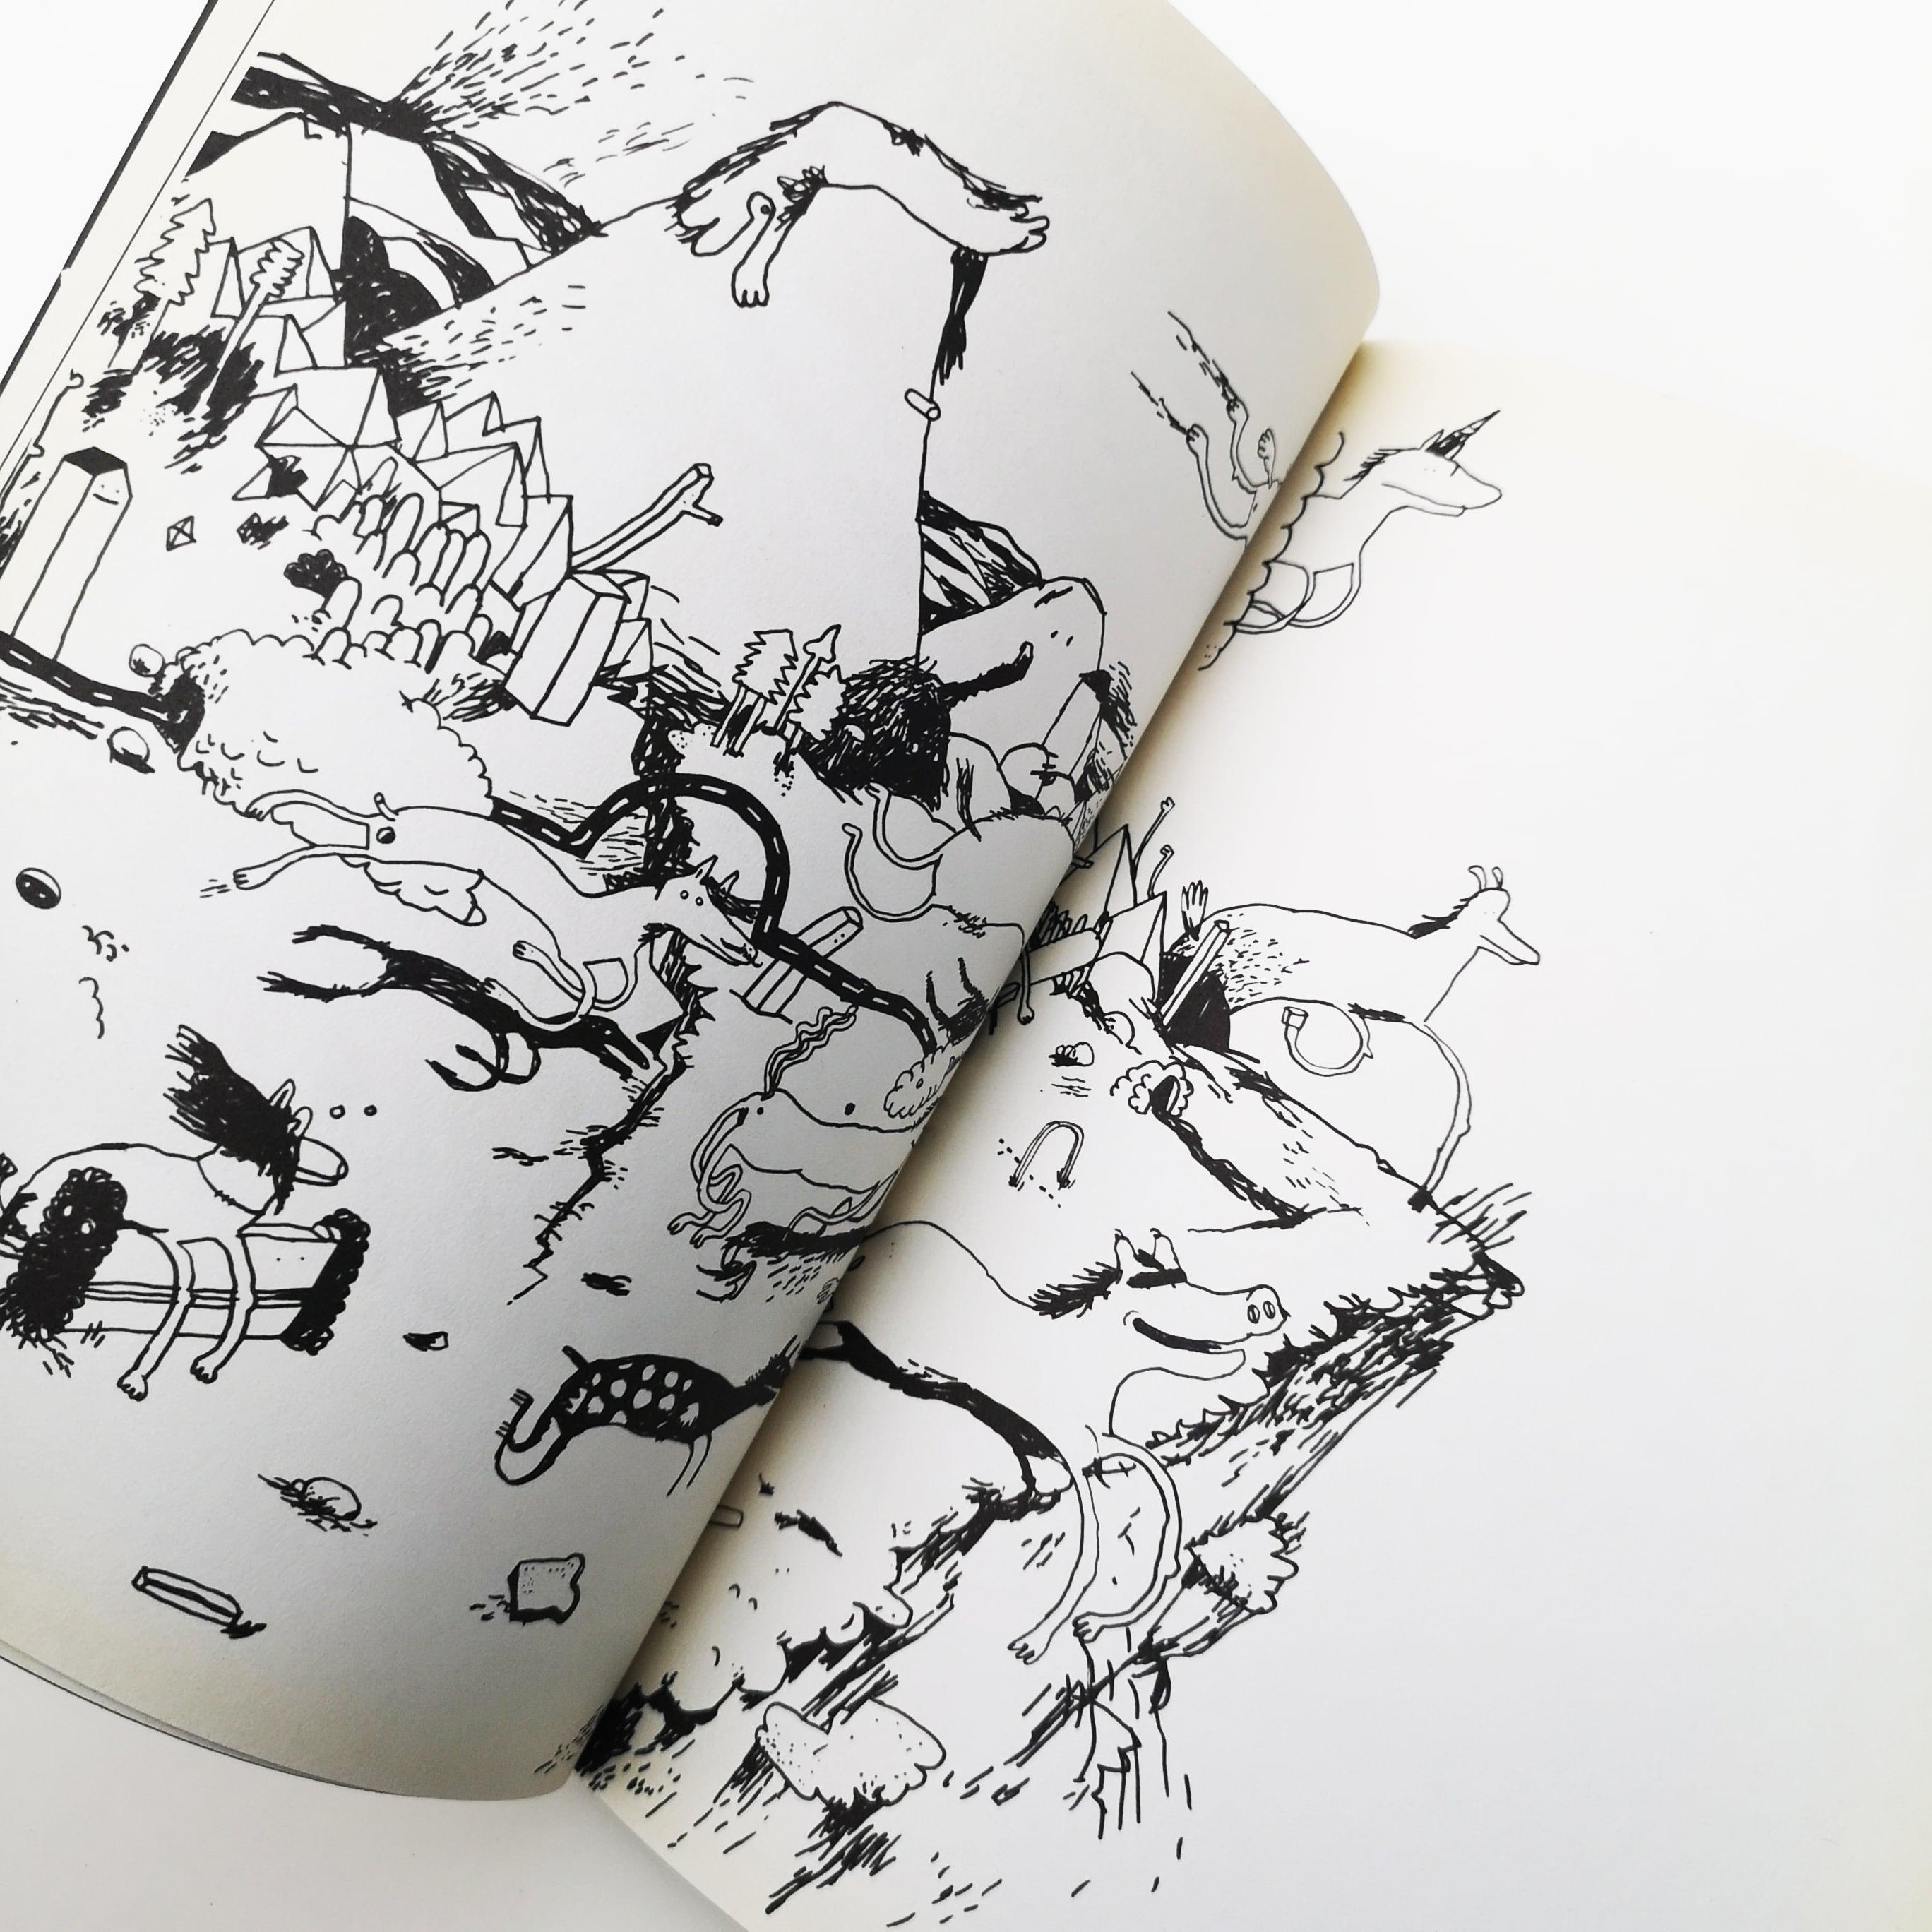 I'M STARTING TO FEEL OKAY (ART BOOK) by Stefan Marx